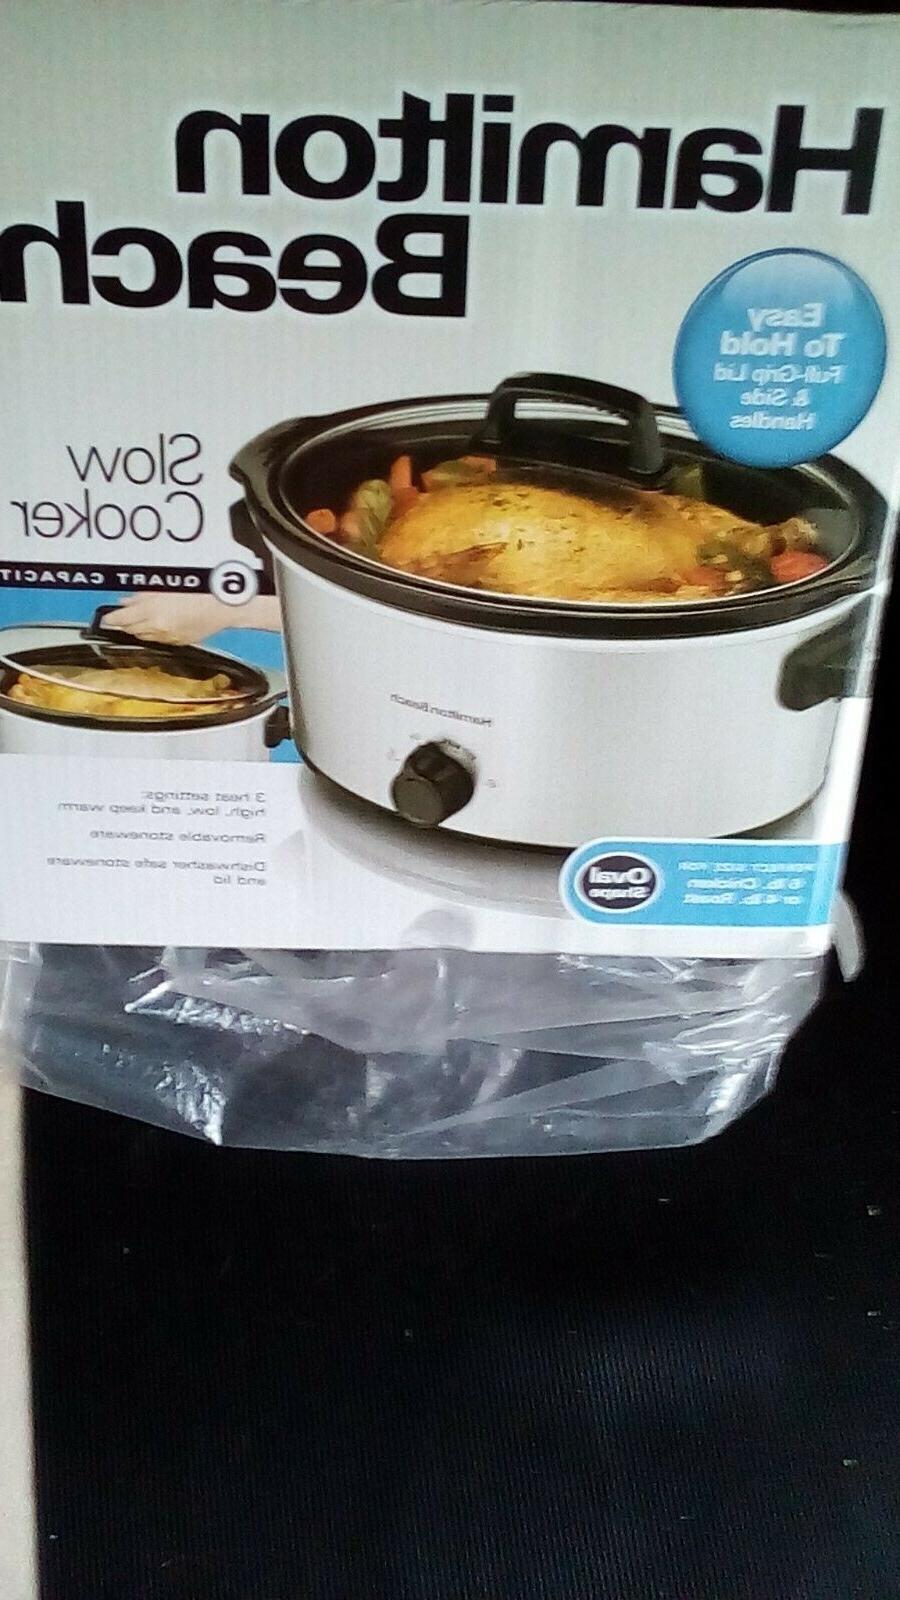 slow cooker model 33665